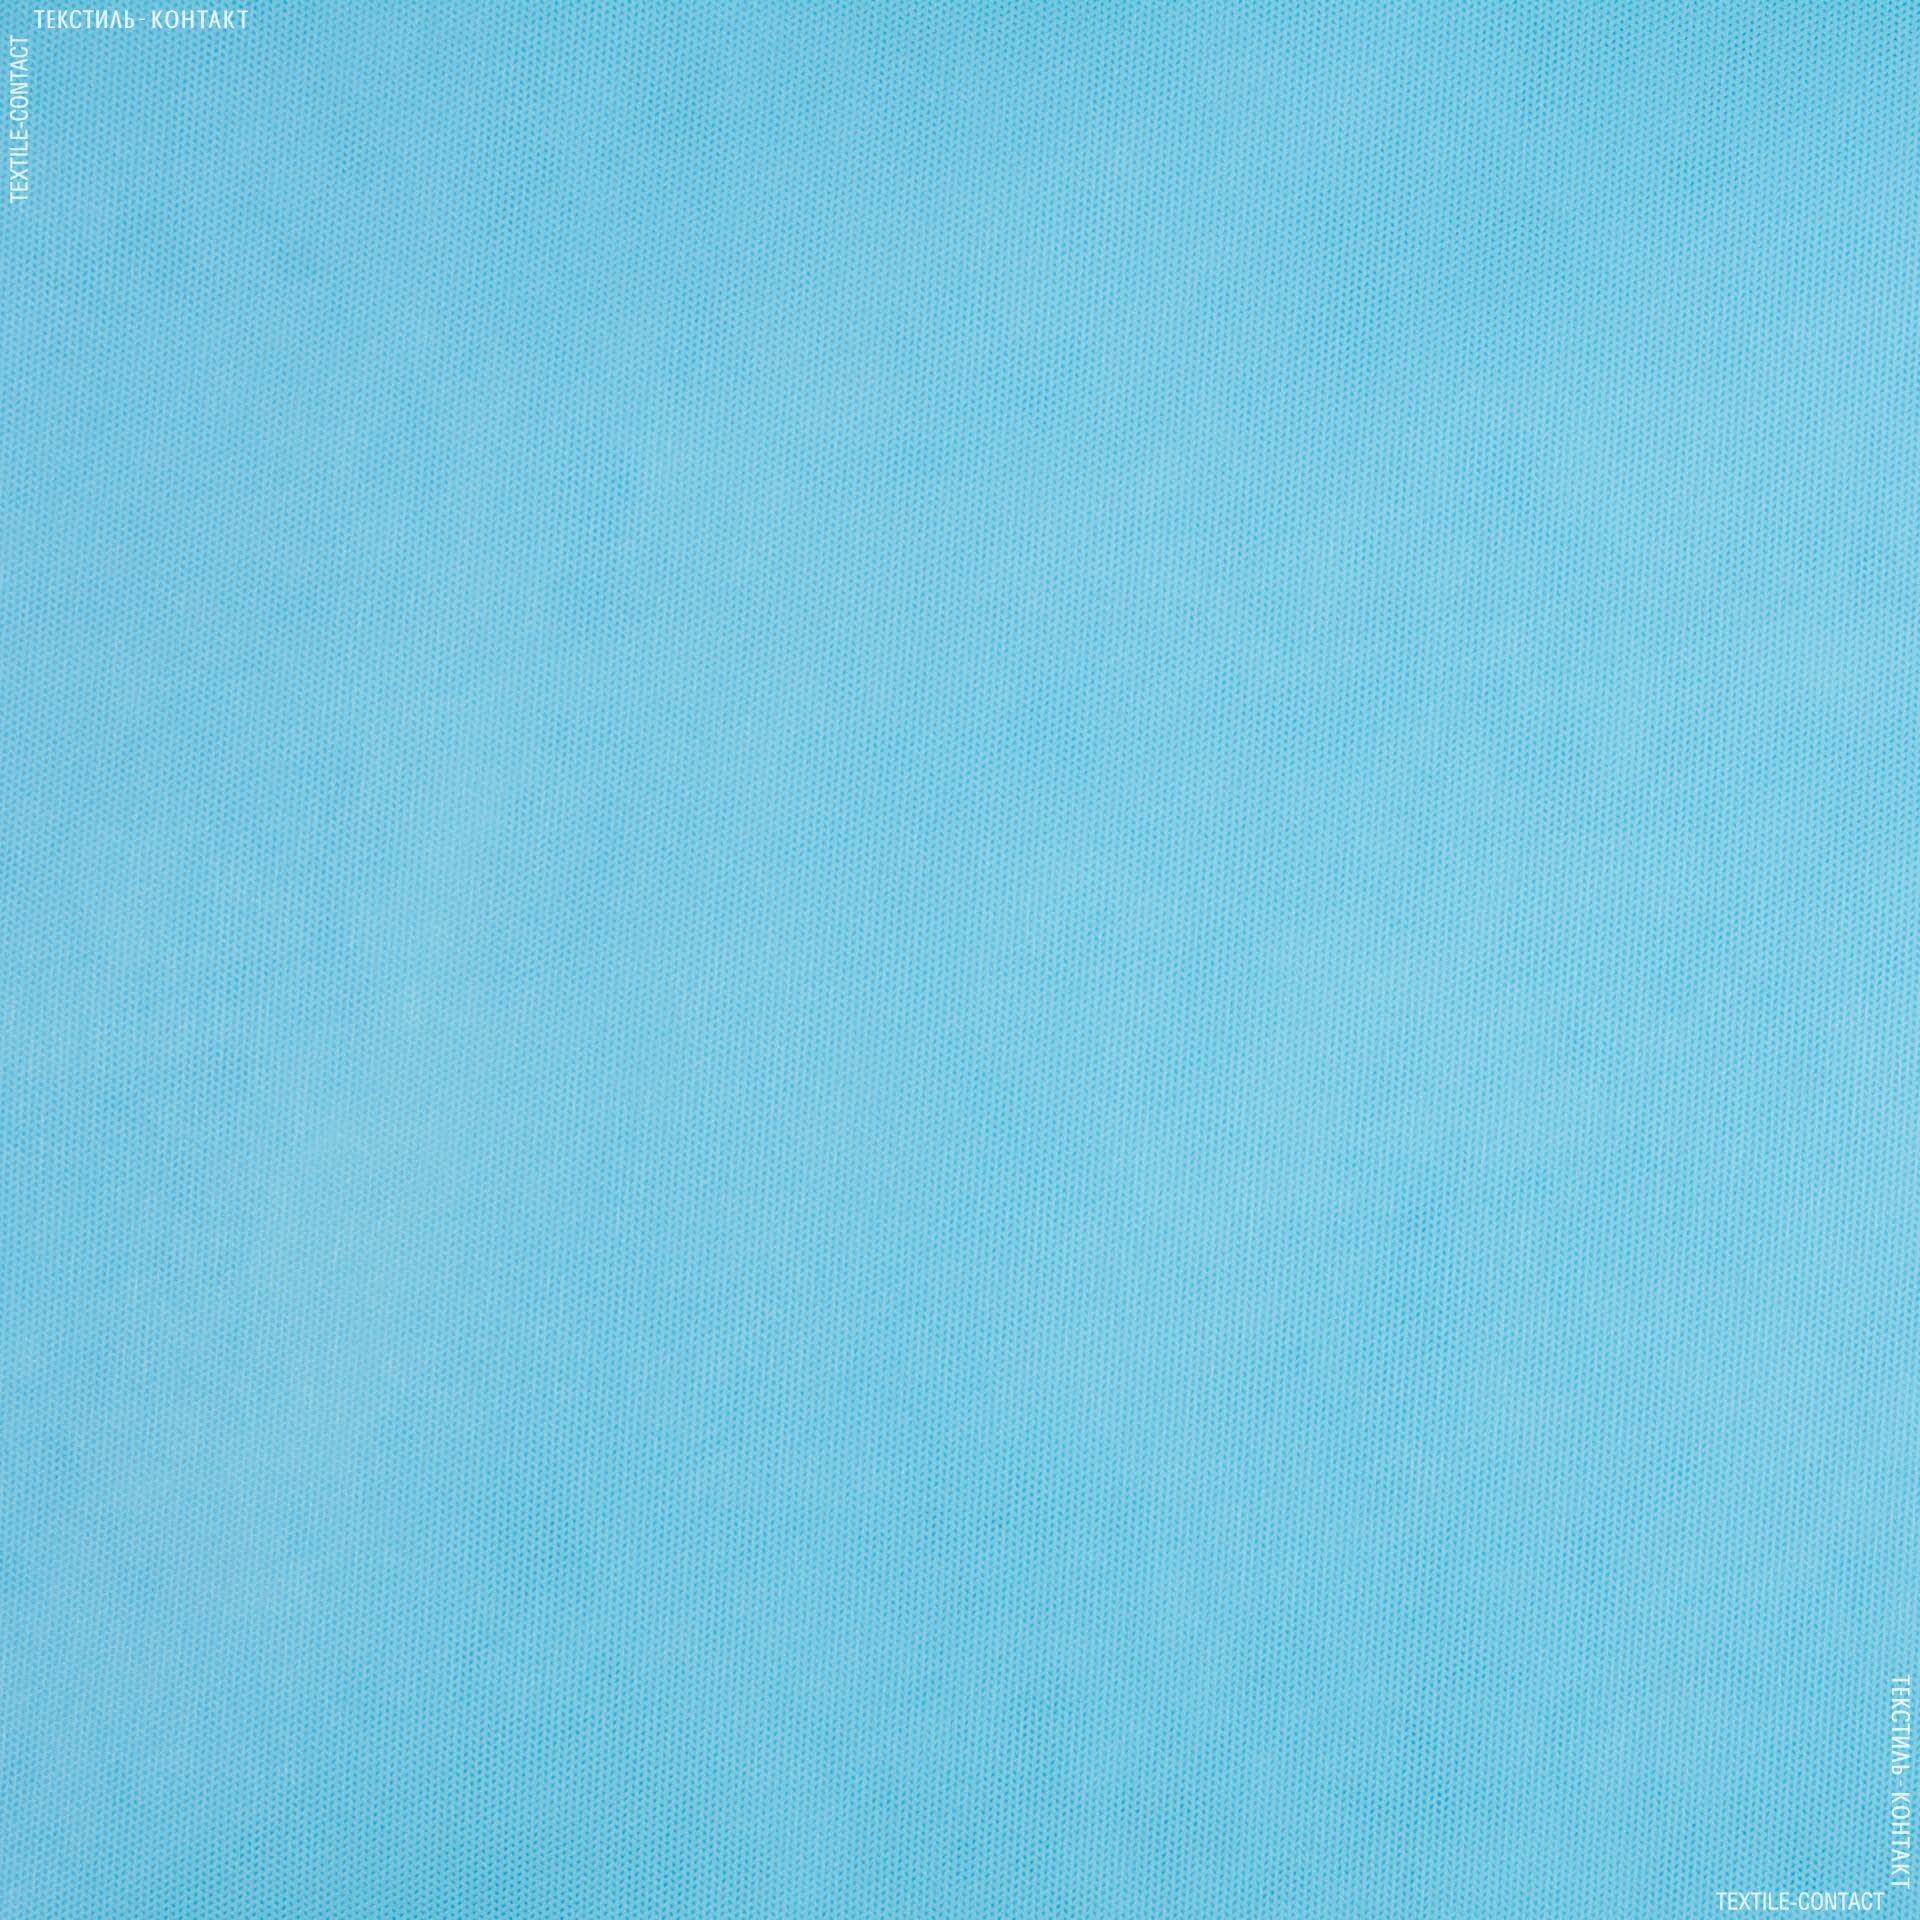 Ткани для сумок - Спанбонд 70 голубой